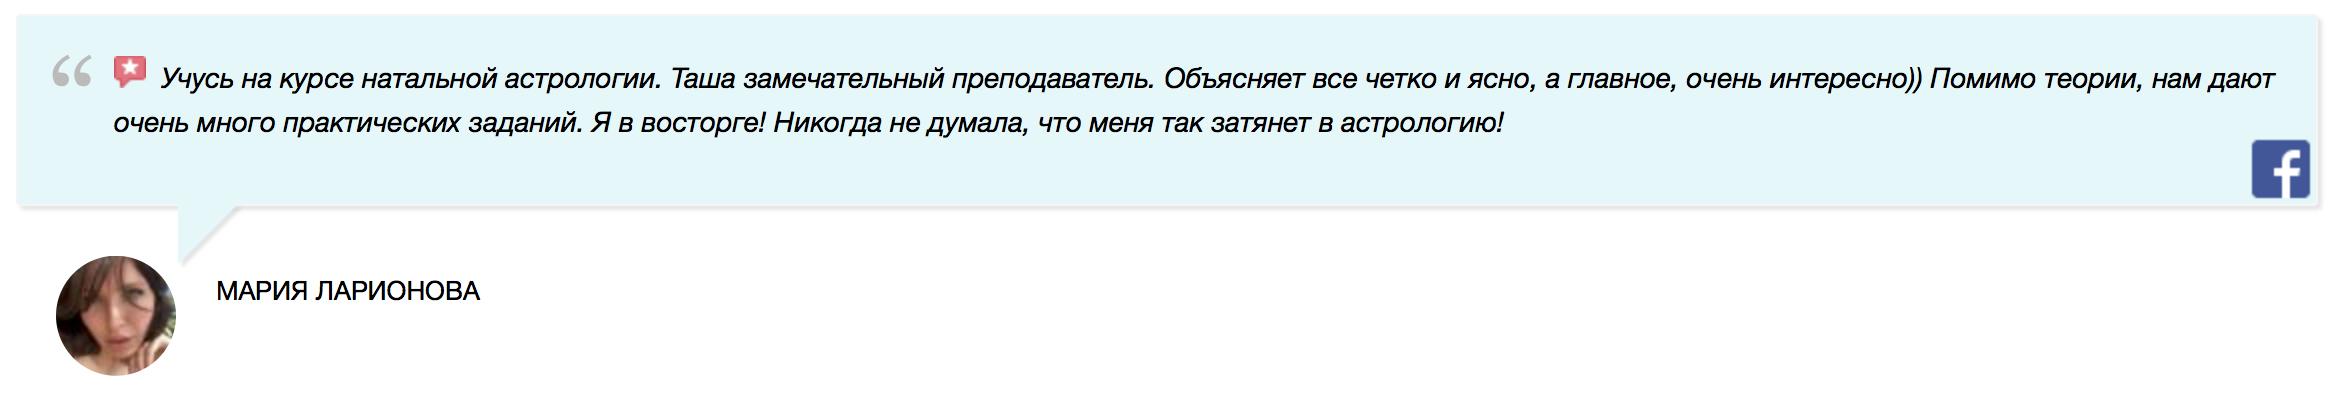 https://astrologtasha.ru/wp-content/uploads/2021/02/Screen-Shot-2021-02-09-at-10.35.19-PM.png